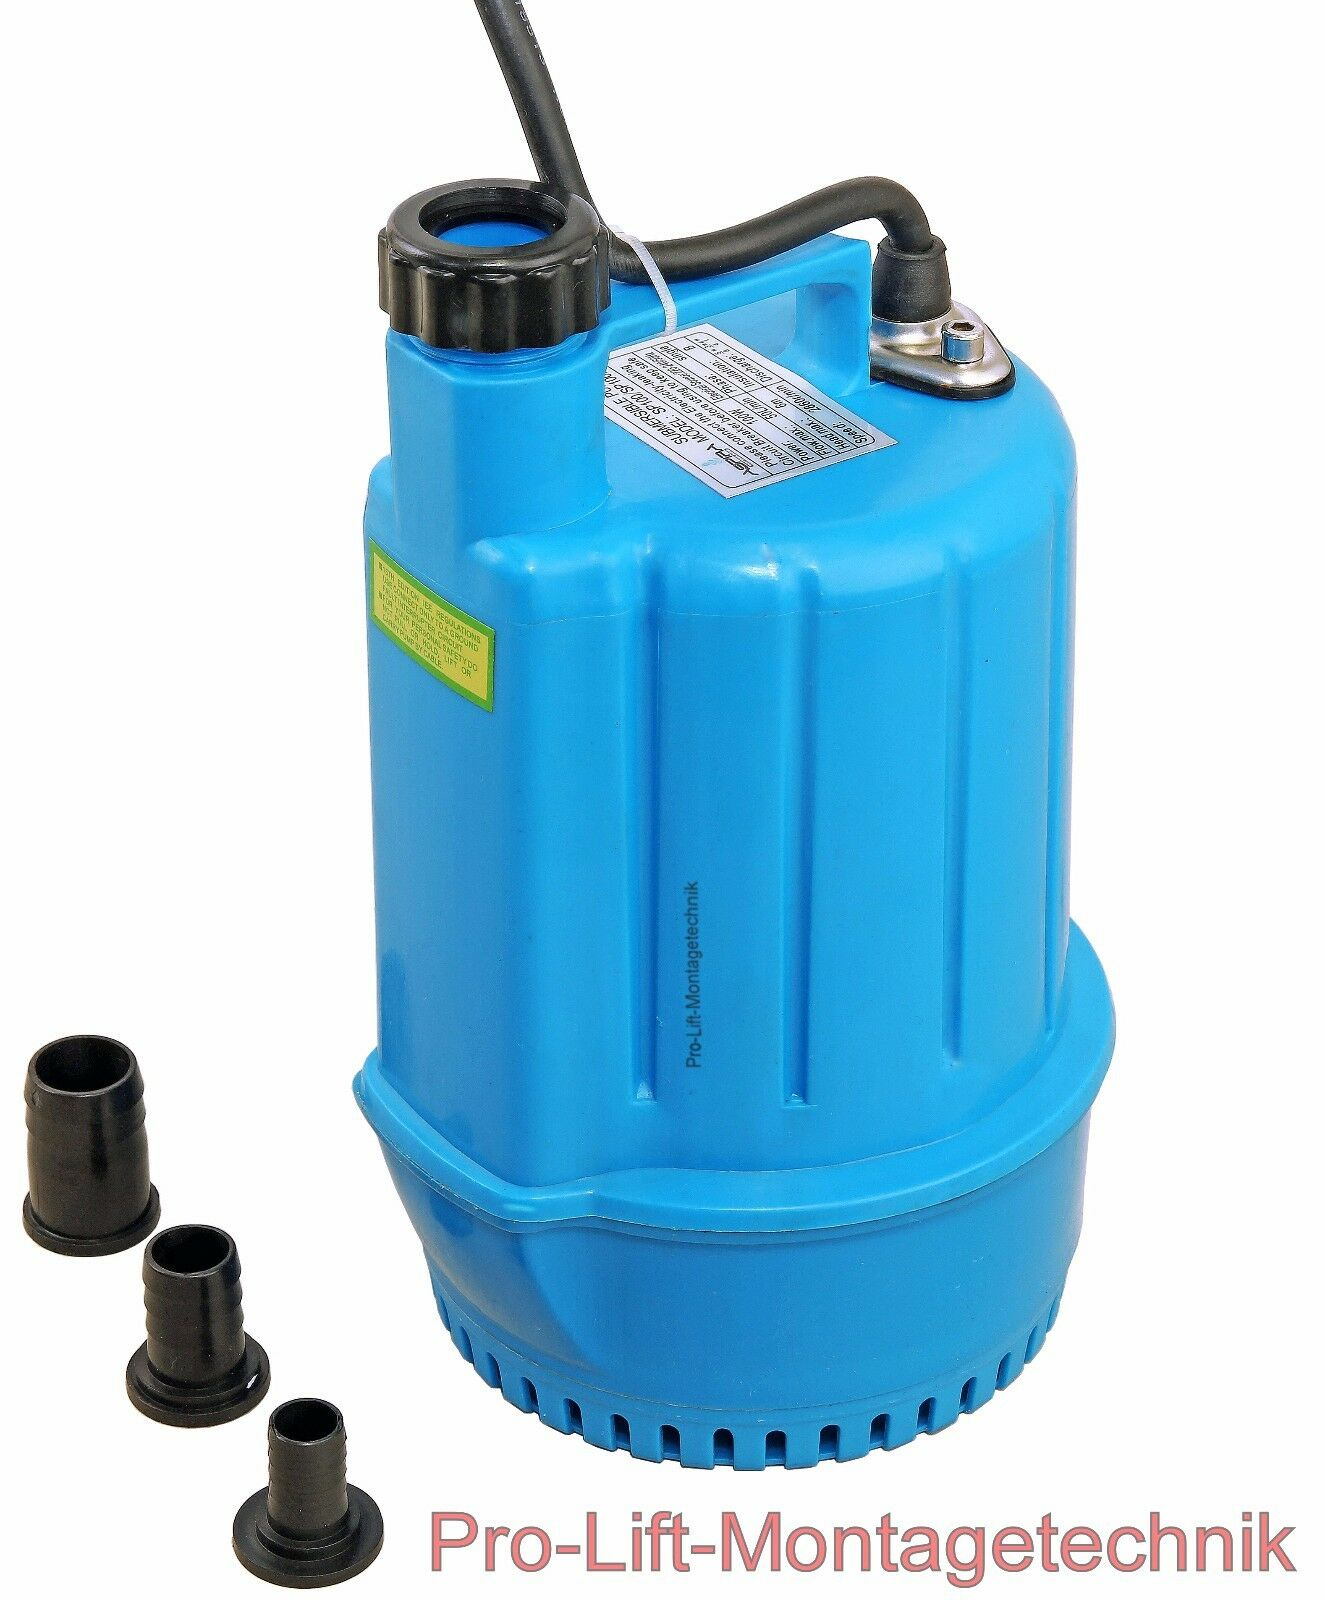 230v sumergible bomba pozo 50l min bomba agua flachsaugend azul sp100j 01959